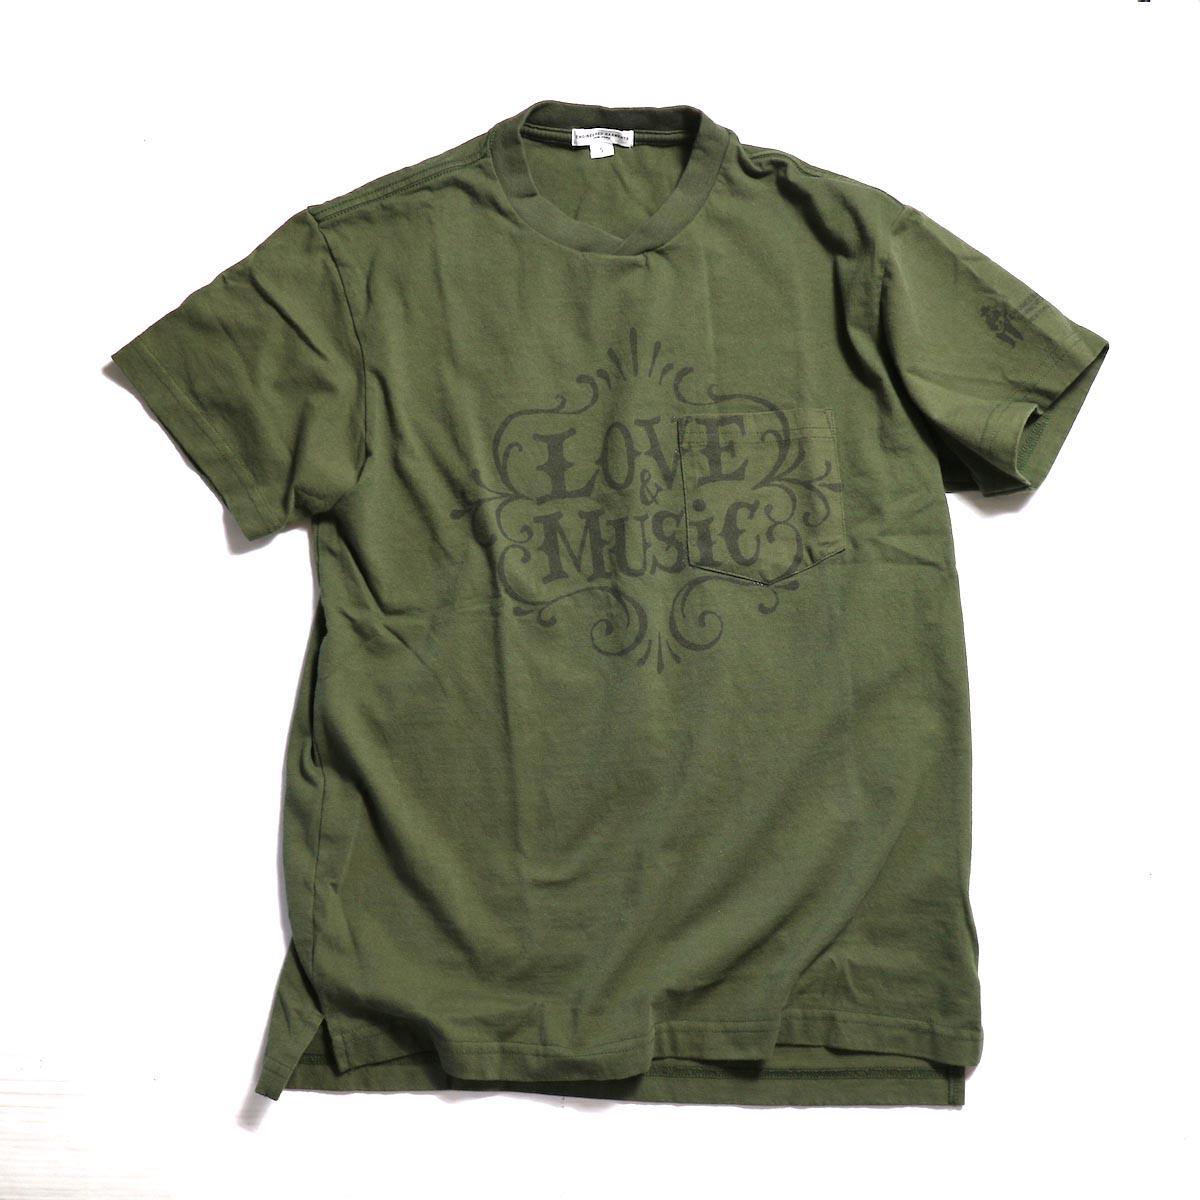 FUTURE PRIMITIVE / FP COACH JKT -LT.BLUEENGINEERED GARMENTS / Printed Cross Crew Neck T-shirt -Love & Music -OLIVE